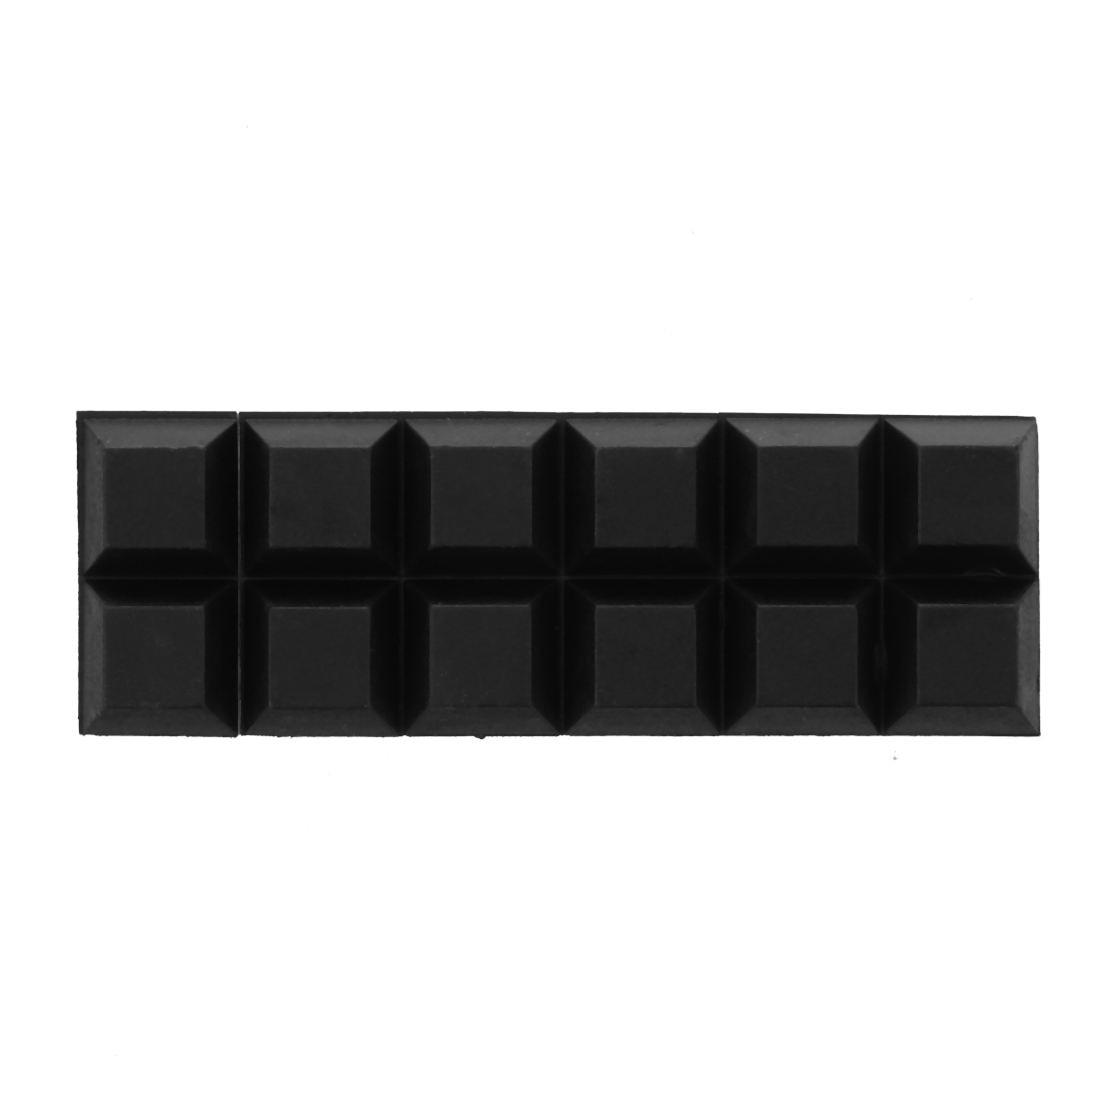 Stoel Meubels Vierkante 12mm X 12mm X 6mm Zelfklevende Rubberen Pads 12 In 1